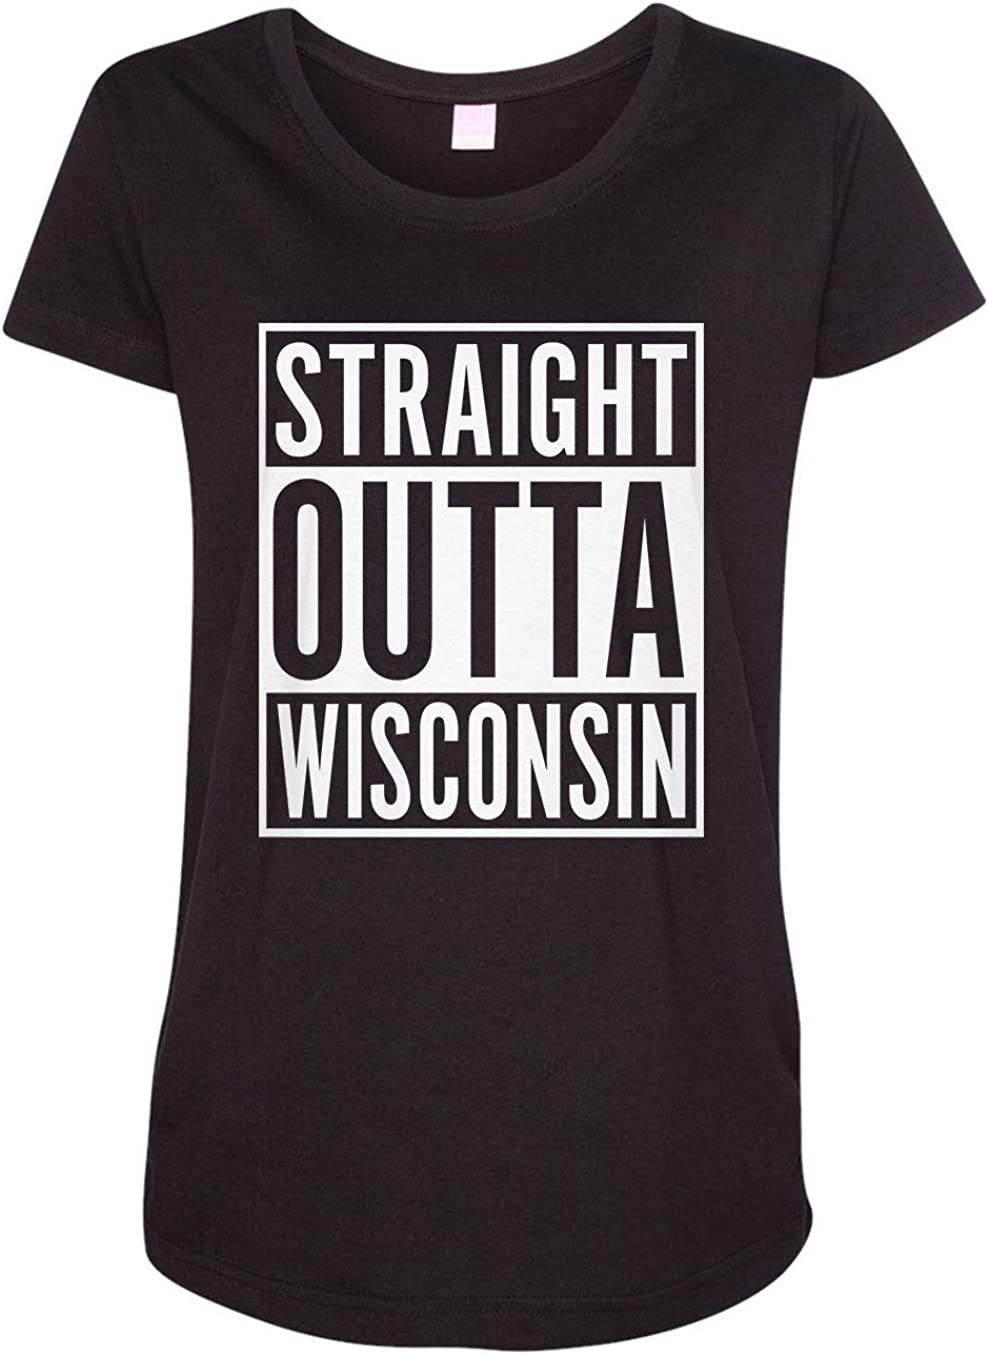 HARD EDGE DESIGN Women's Straight Outta Wisconsin T-Shirt